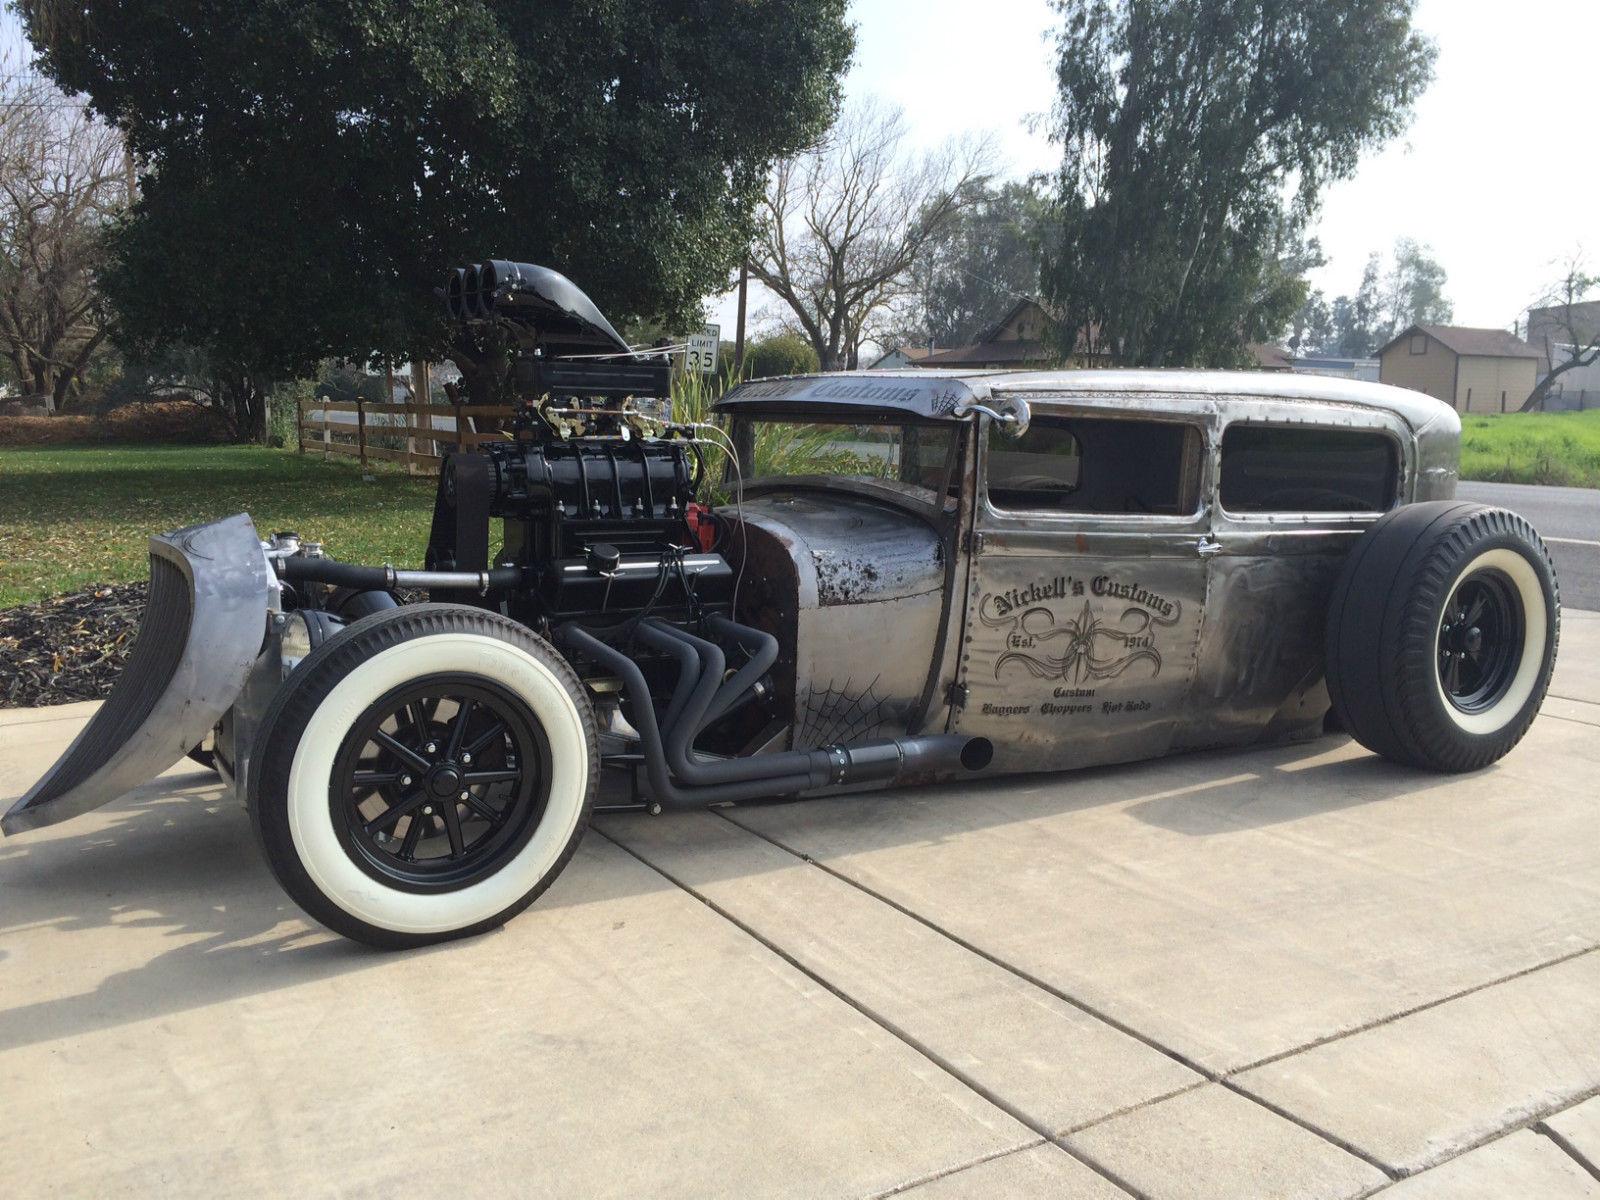 1929 ford tudor sedan-steel-chopped-new frame-air ride-350 mtr-rat ...